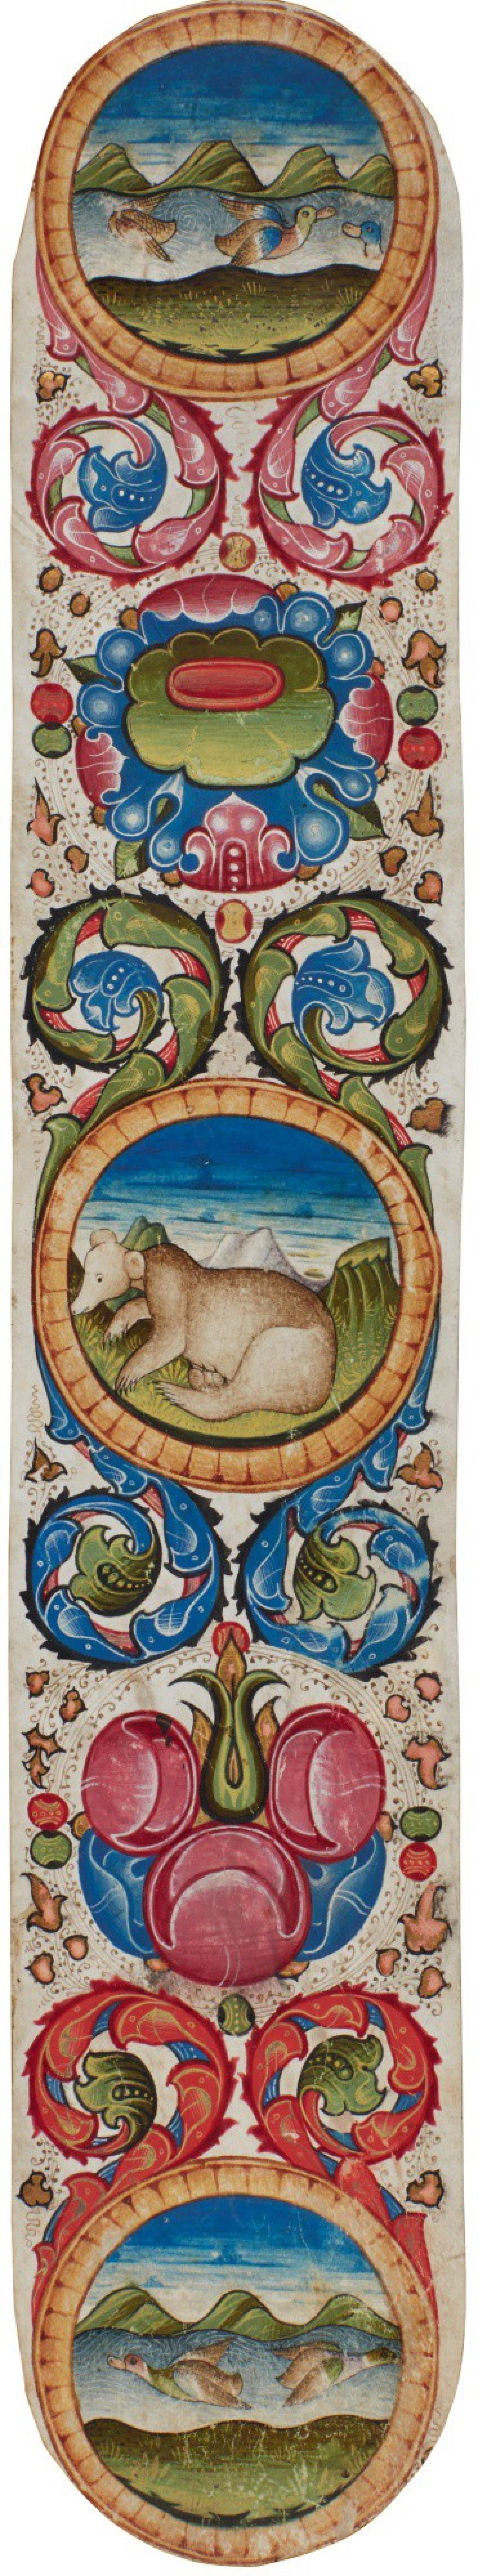 Ducks and a Bear in a large illuminated border [Italy (Brescia), 15th century (3rd quarter)]